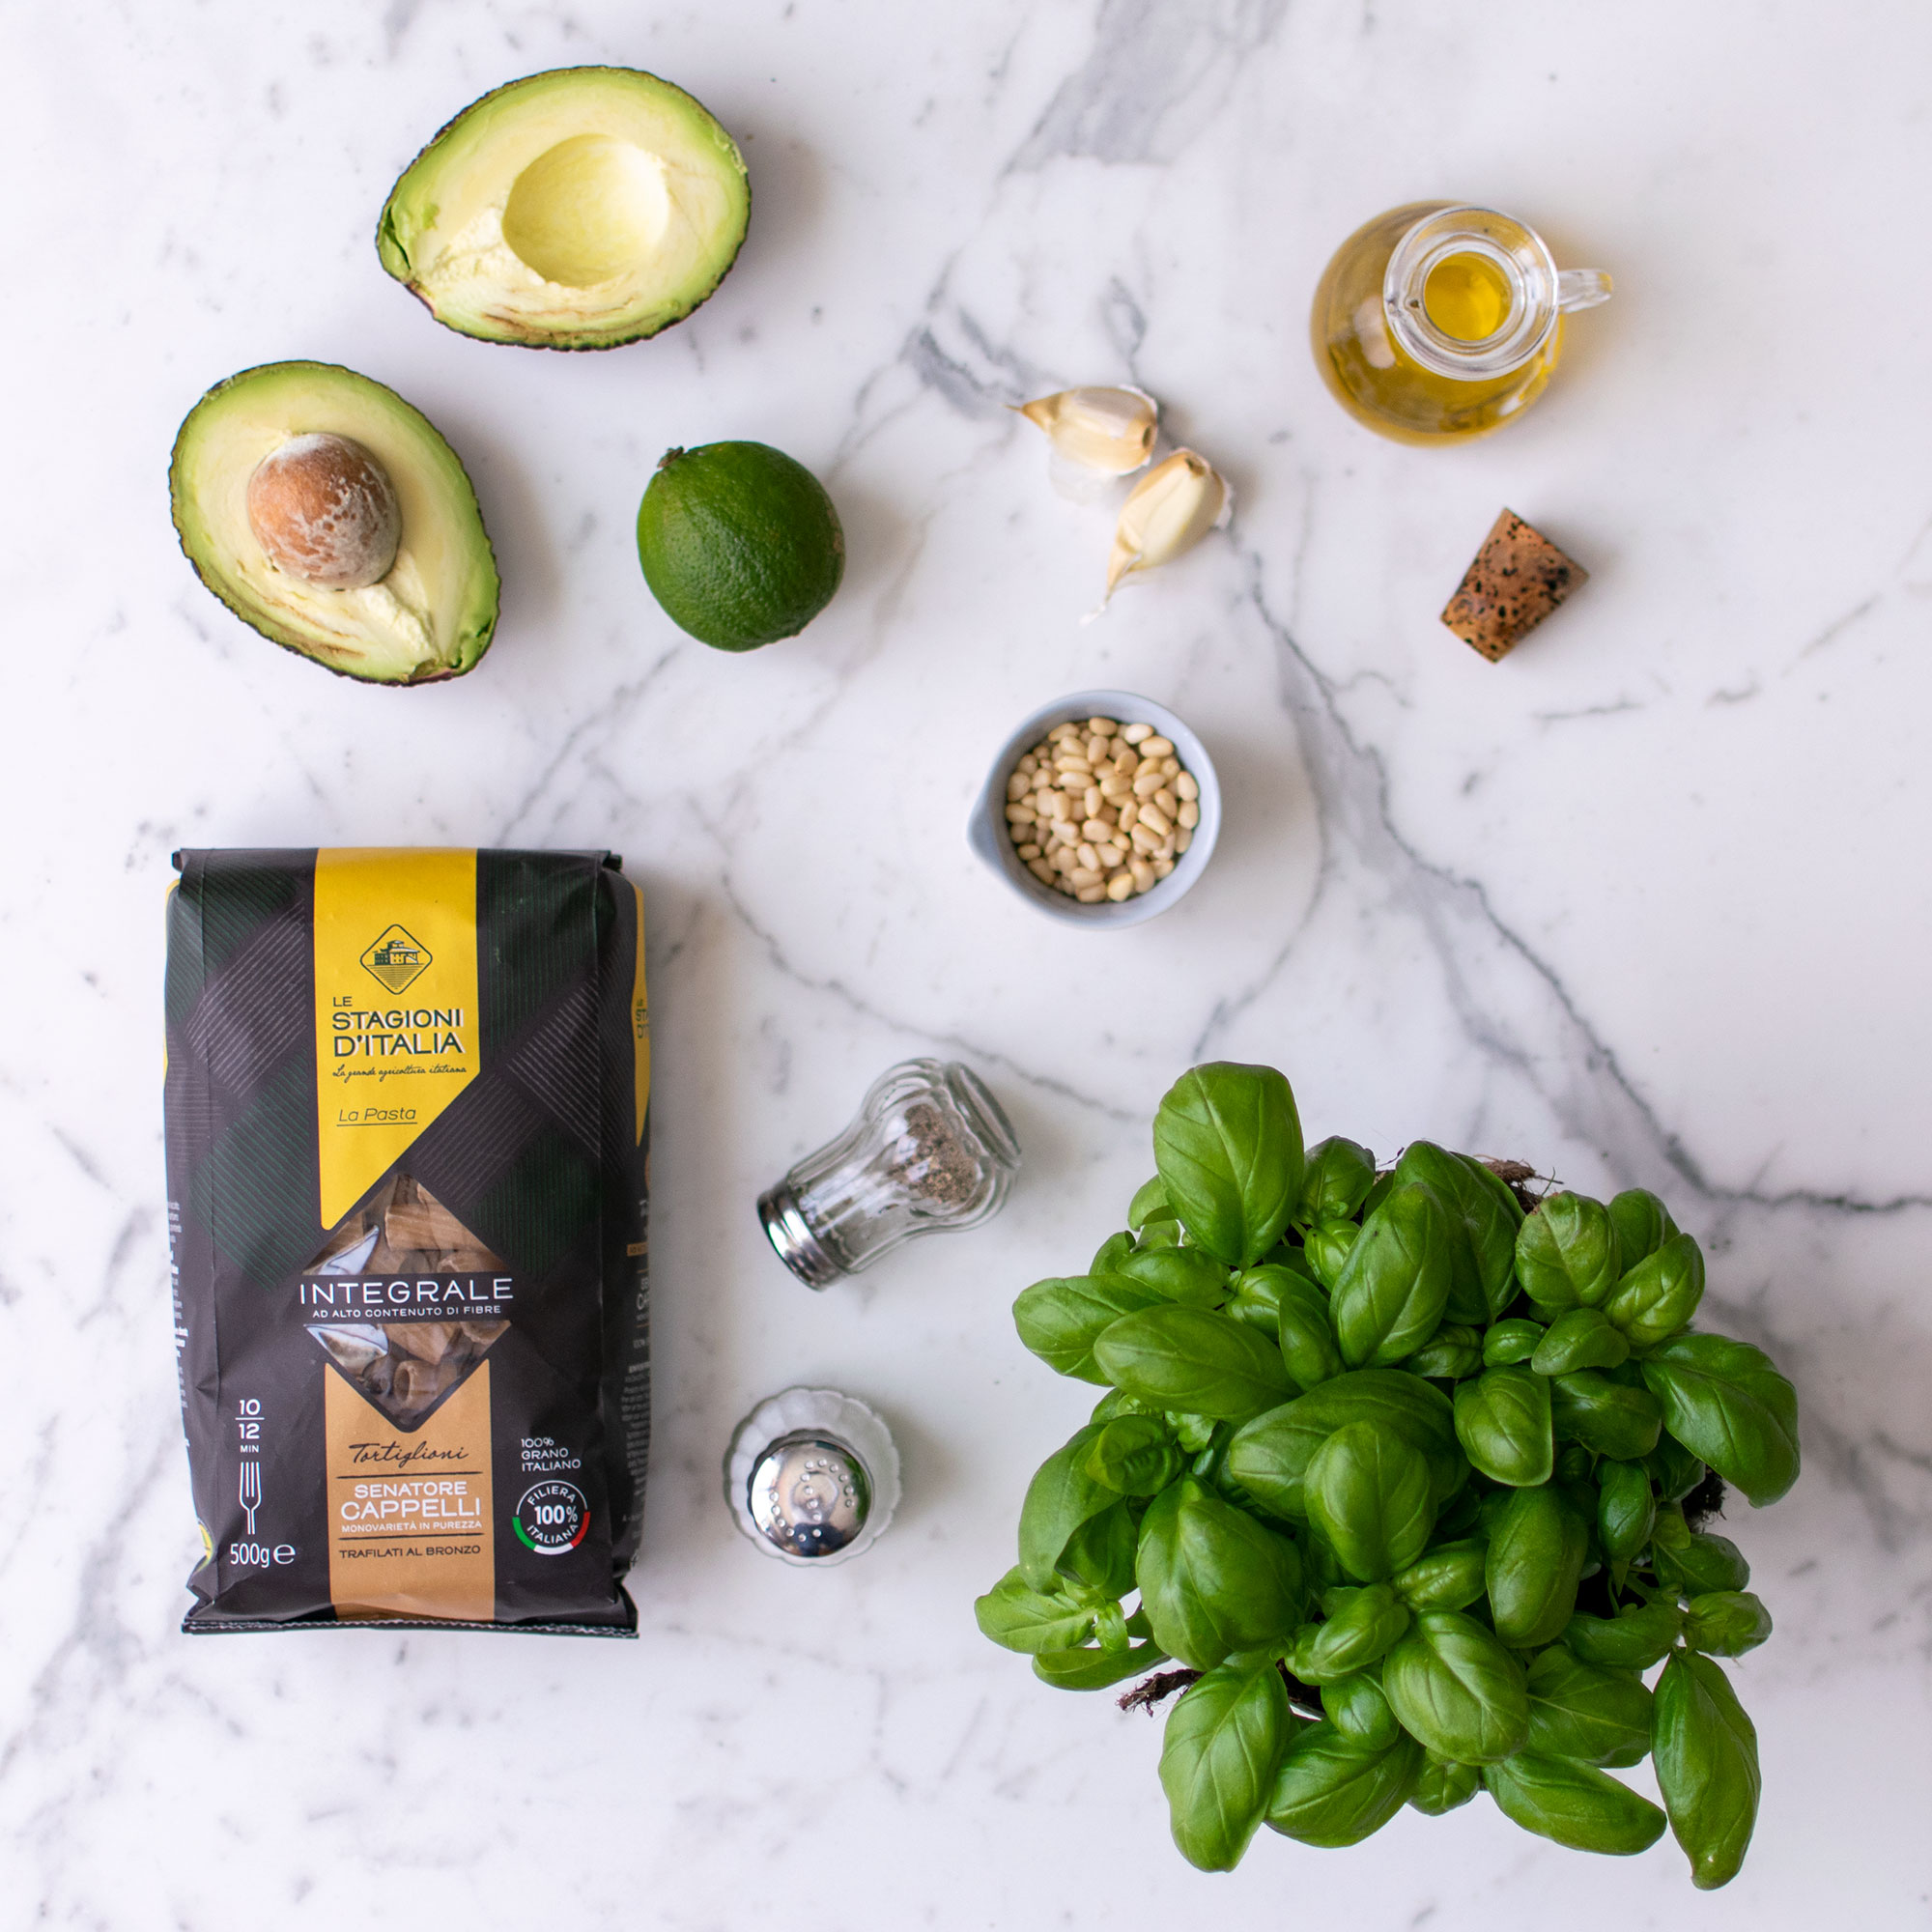 pesto_avocado_basilico_pinoli_tortiglioni_ingredienti_2